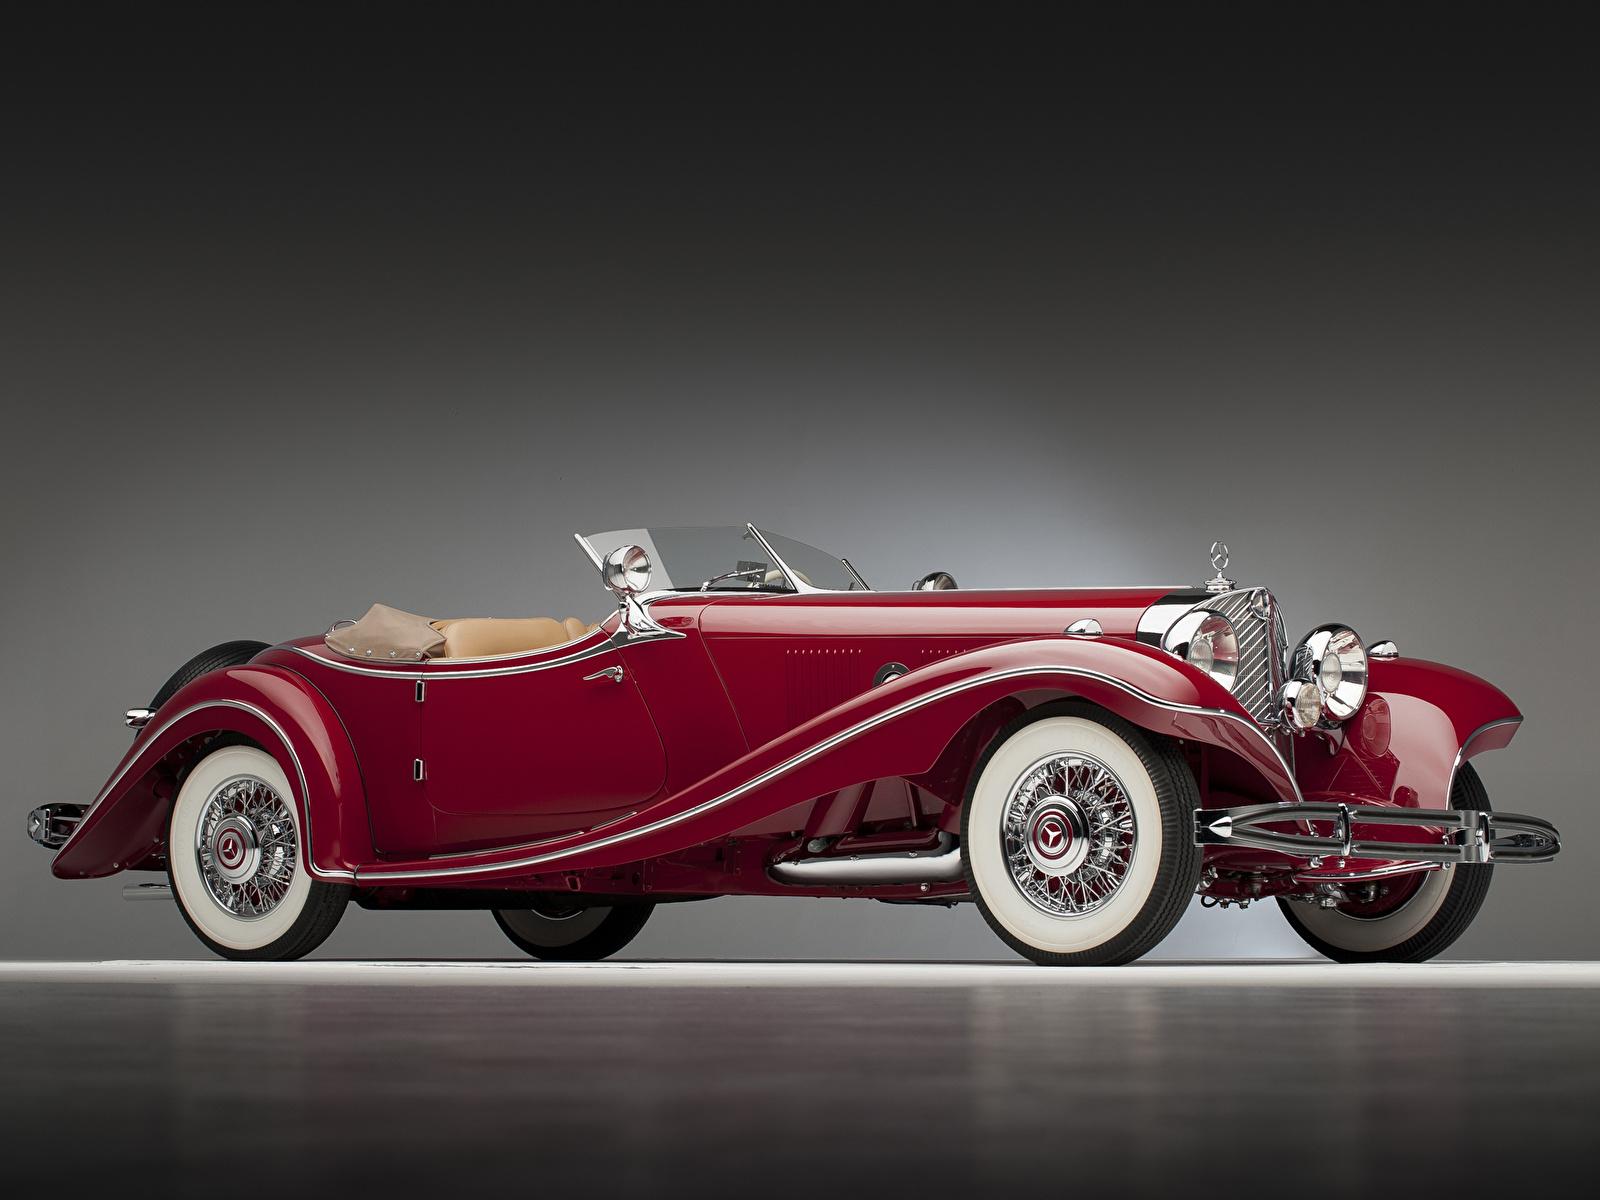 Картинки Mercedes-Benz 500K Luxury Roadster 1935 Родстер Автомобили 1600x1200 Мерседес бенц авто машина машины автомобиль